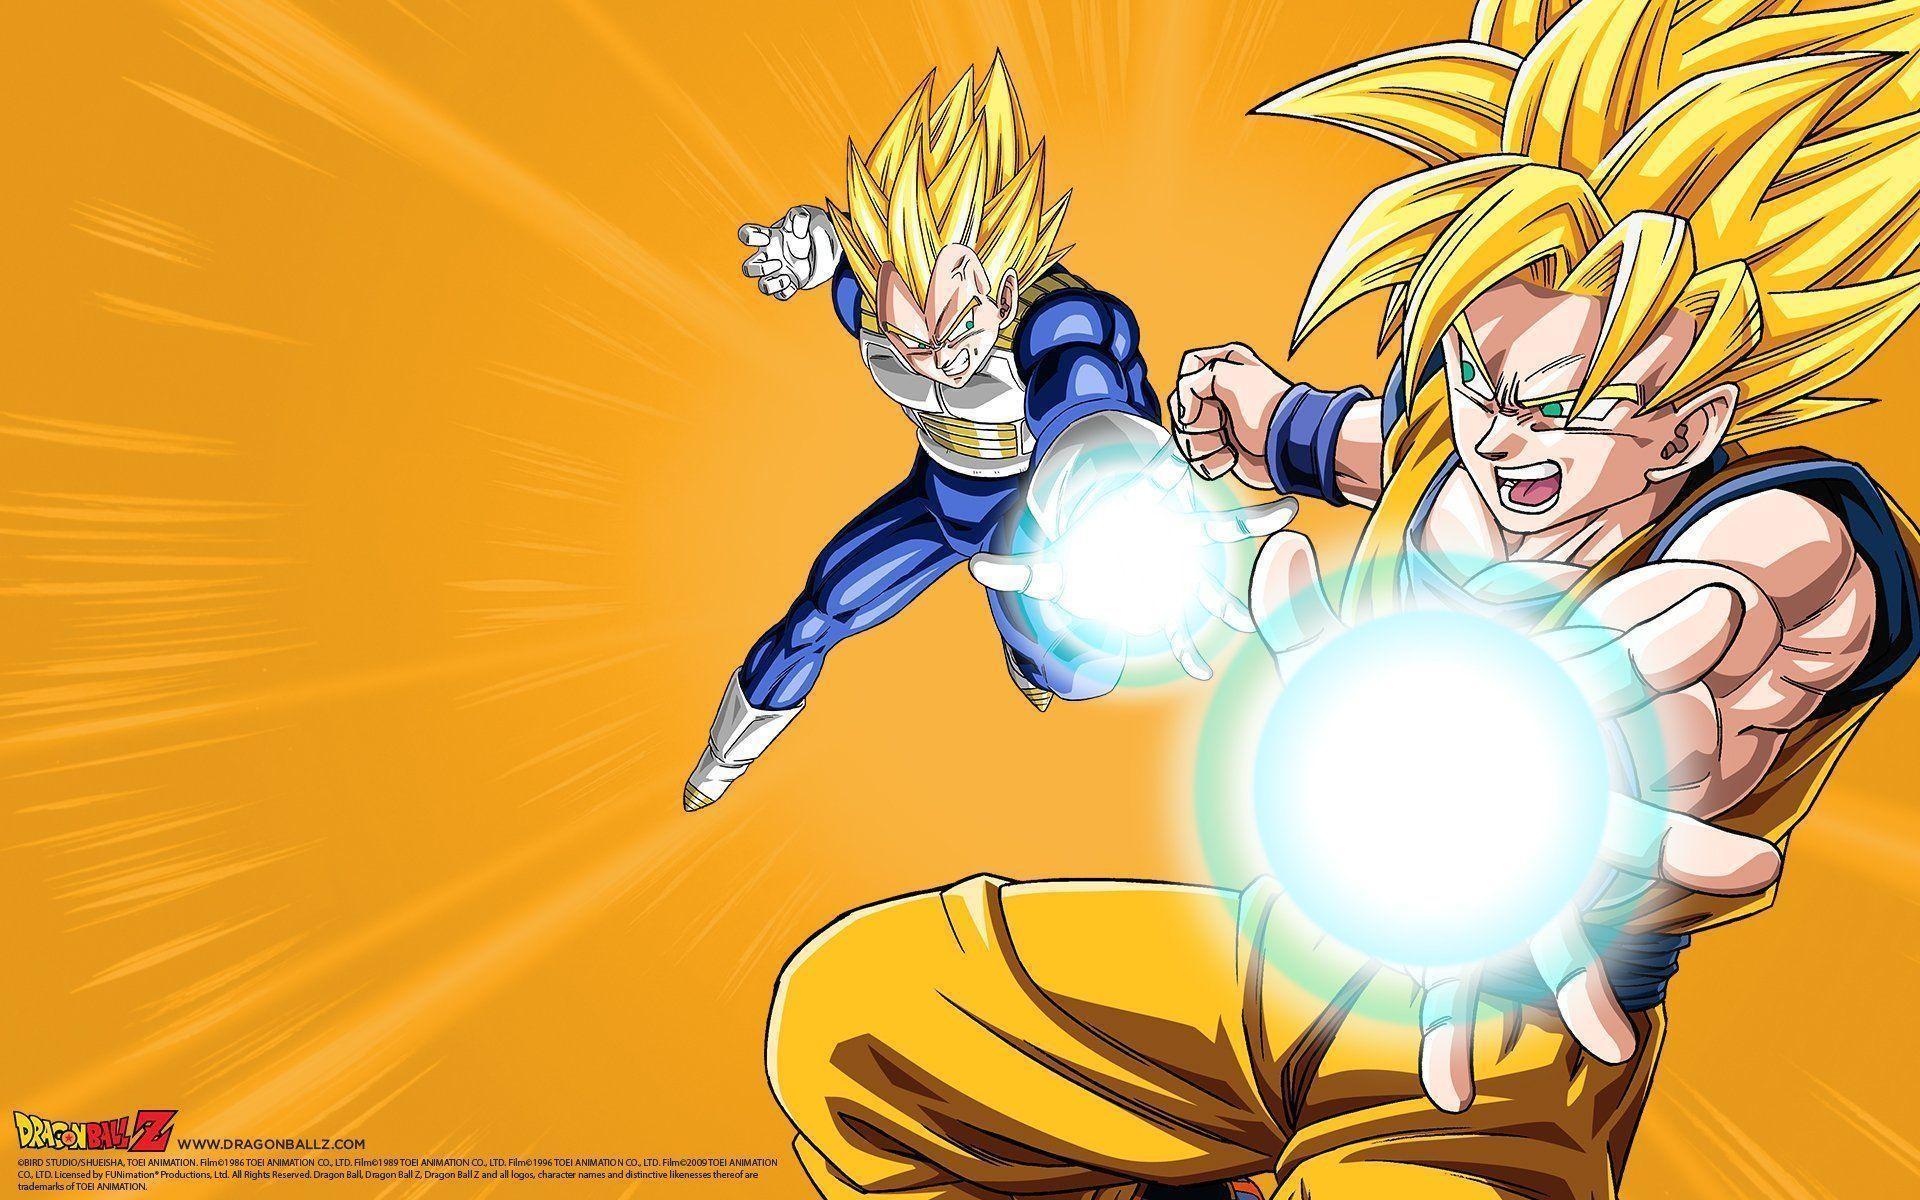 Dragon Ball Z Wallpaper Goku Super Saiyan God Wallpapers Wide .